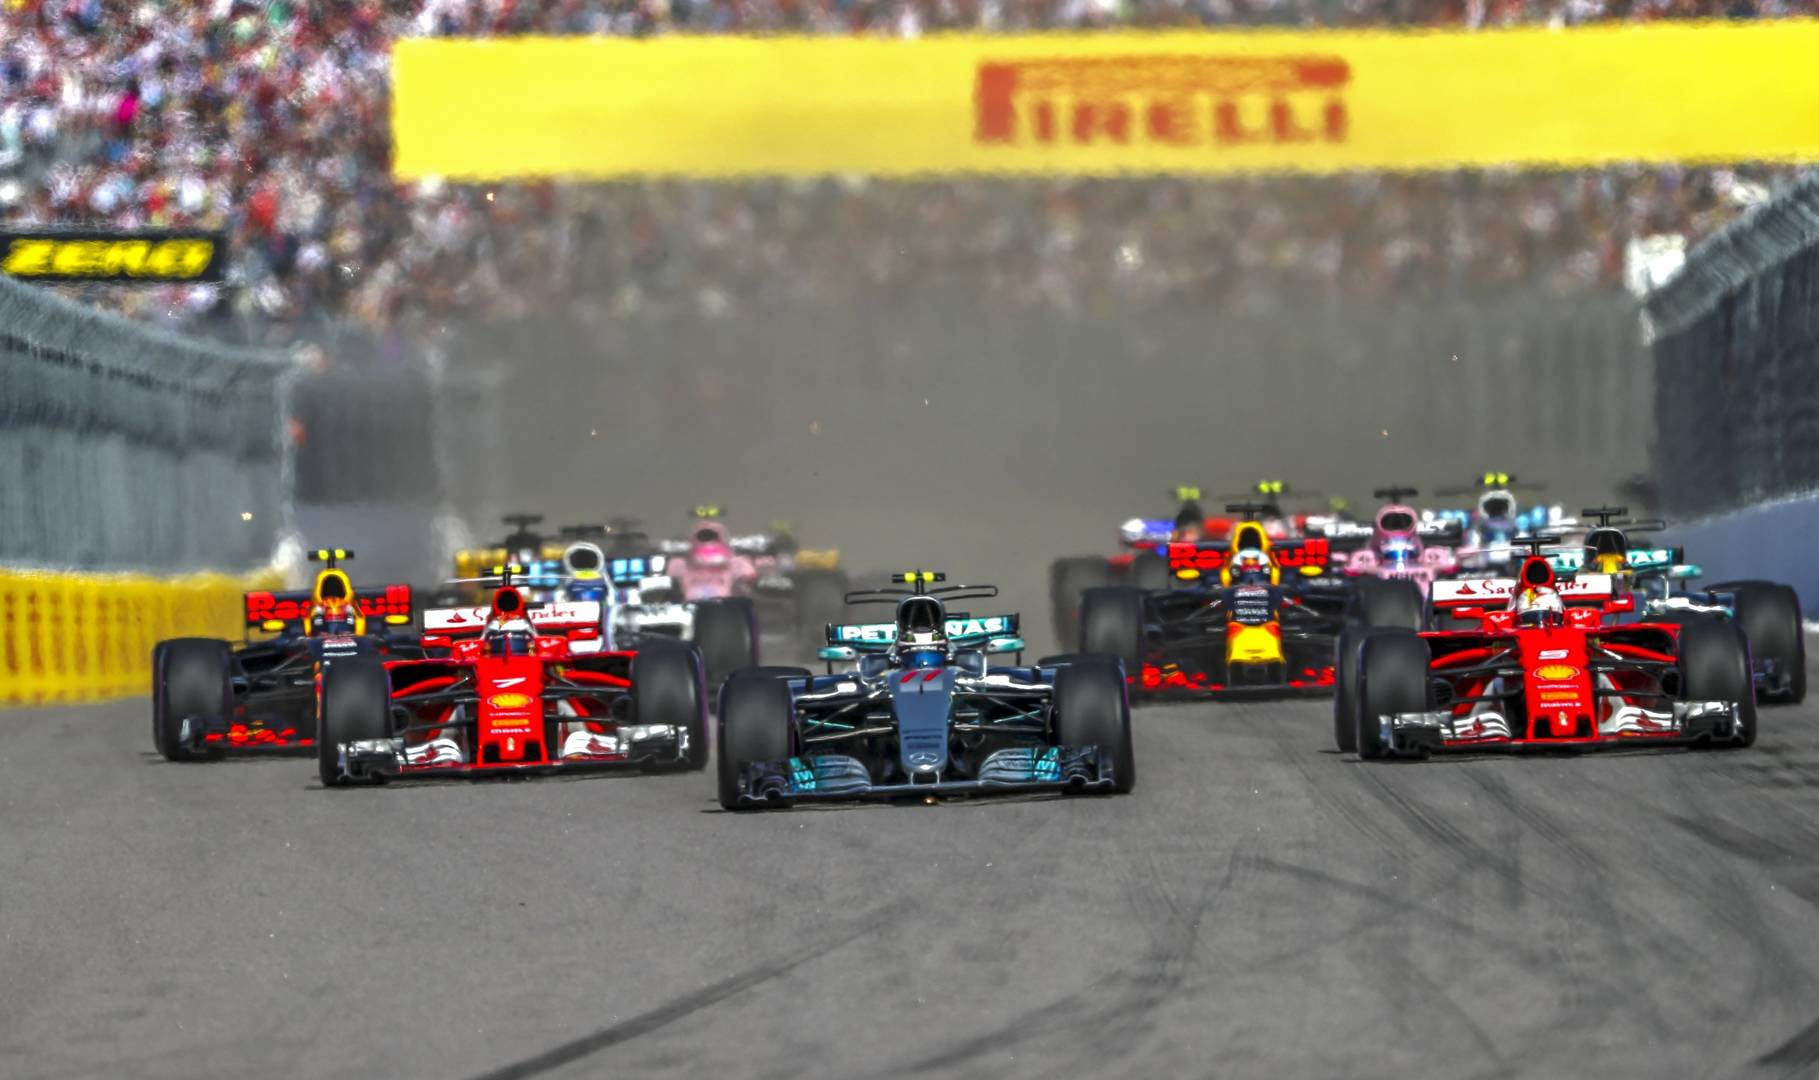 Se cancelan 3 grandes premios de Fórmula 1